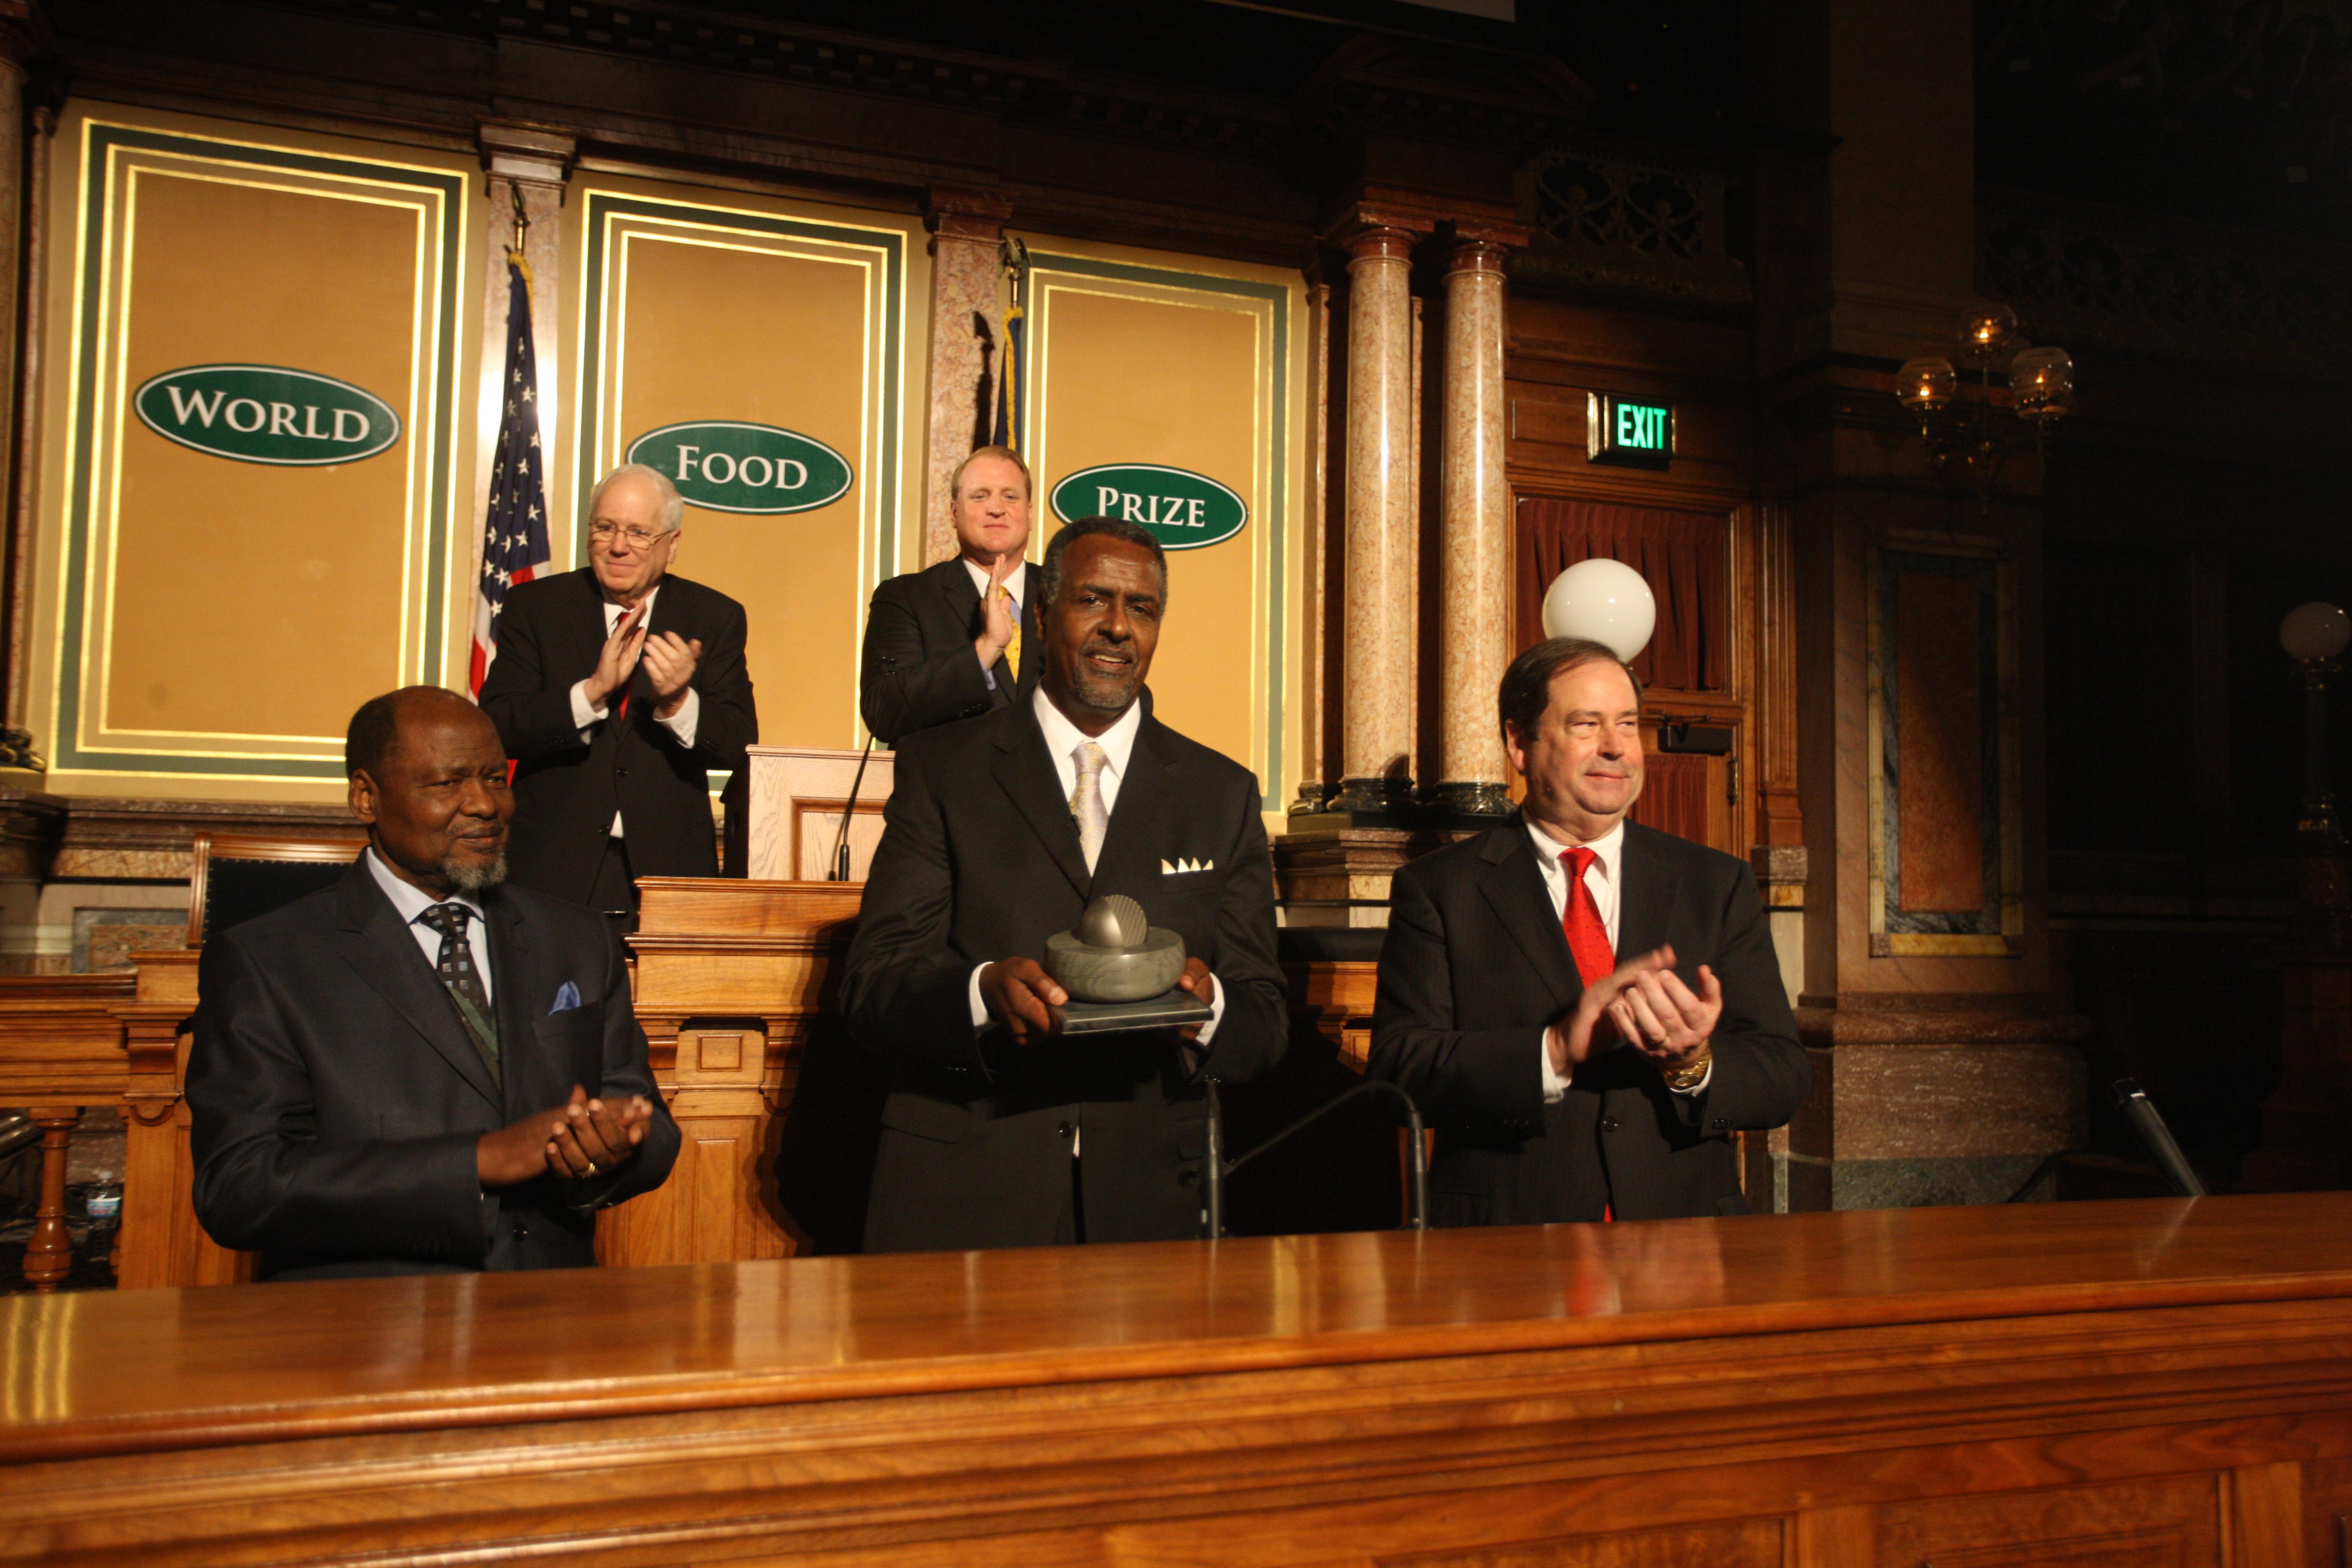 2009 Laureate Award Ceremony